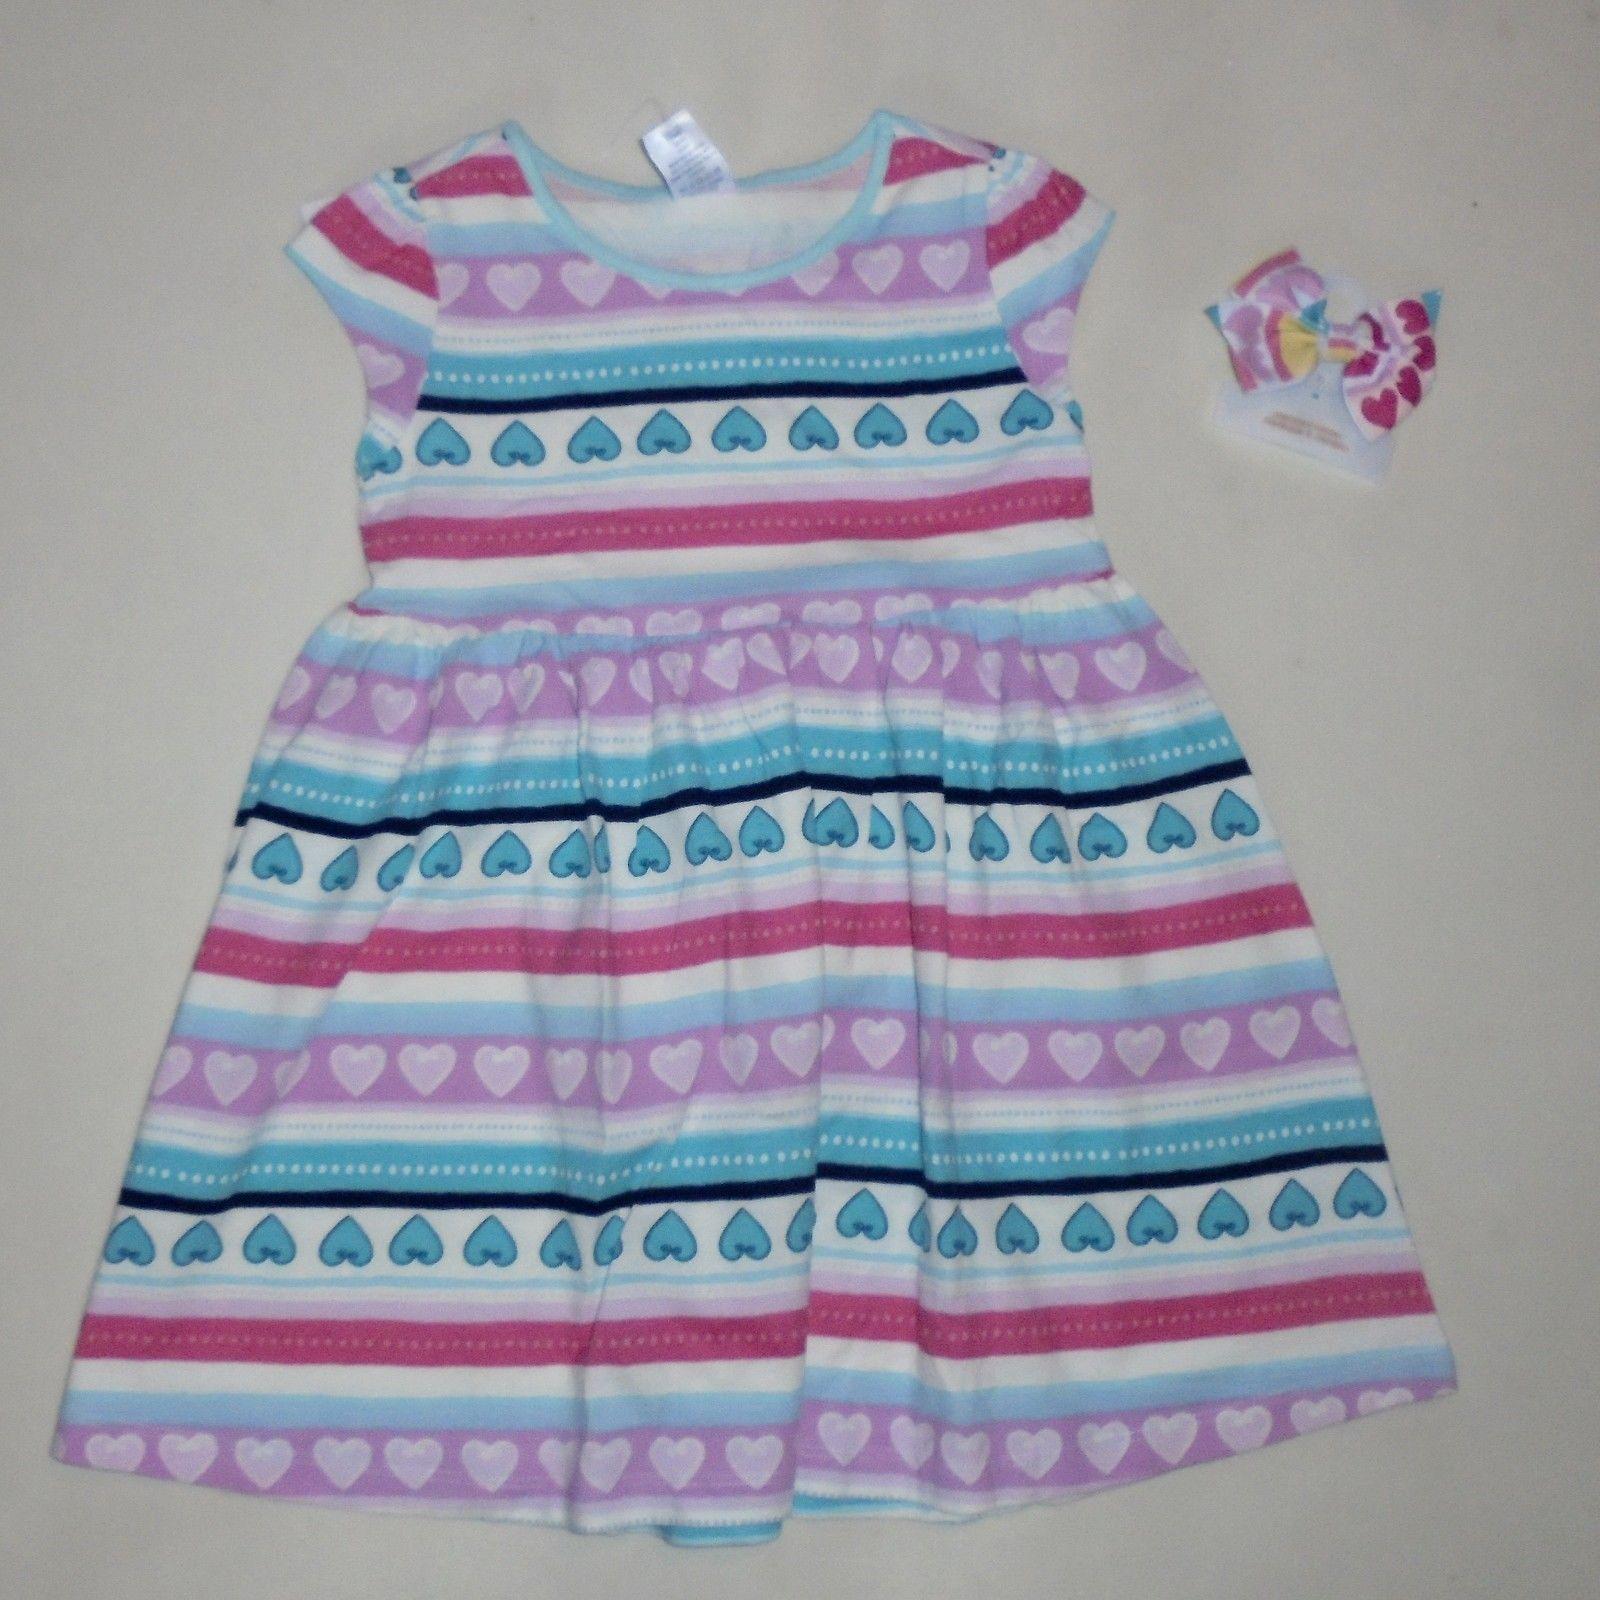 NWT Gymboree Pink Capri Leggings Toddler Girls 18-24,2T,4T,5T